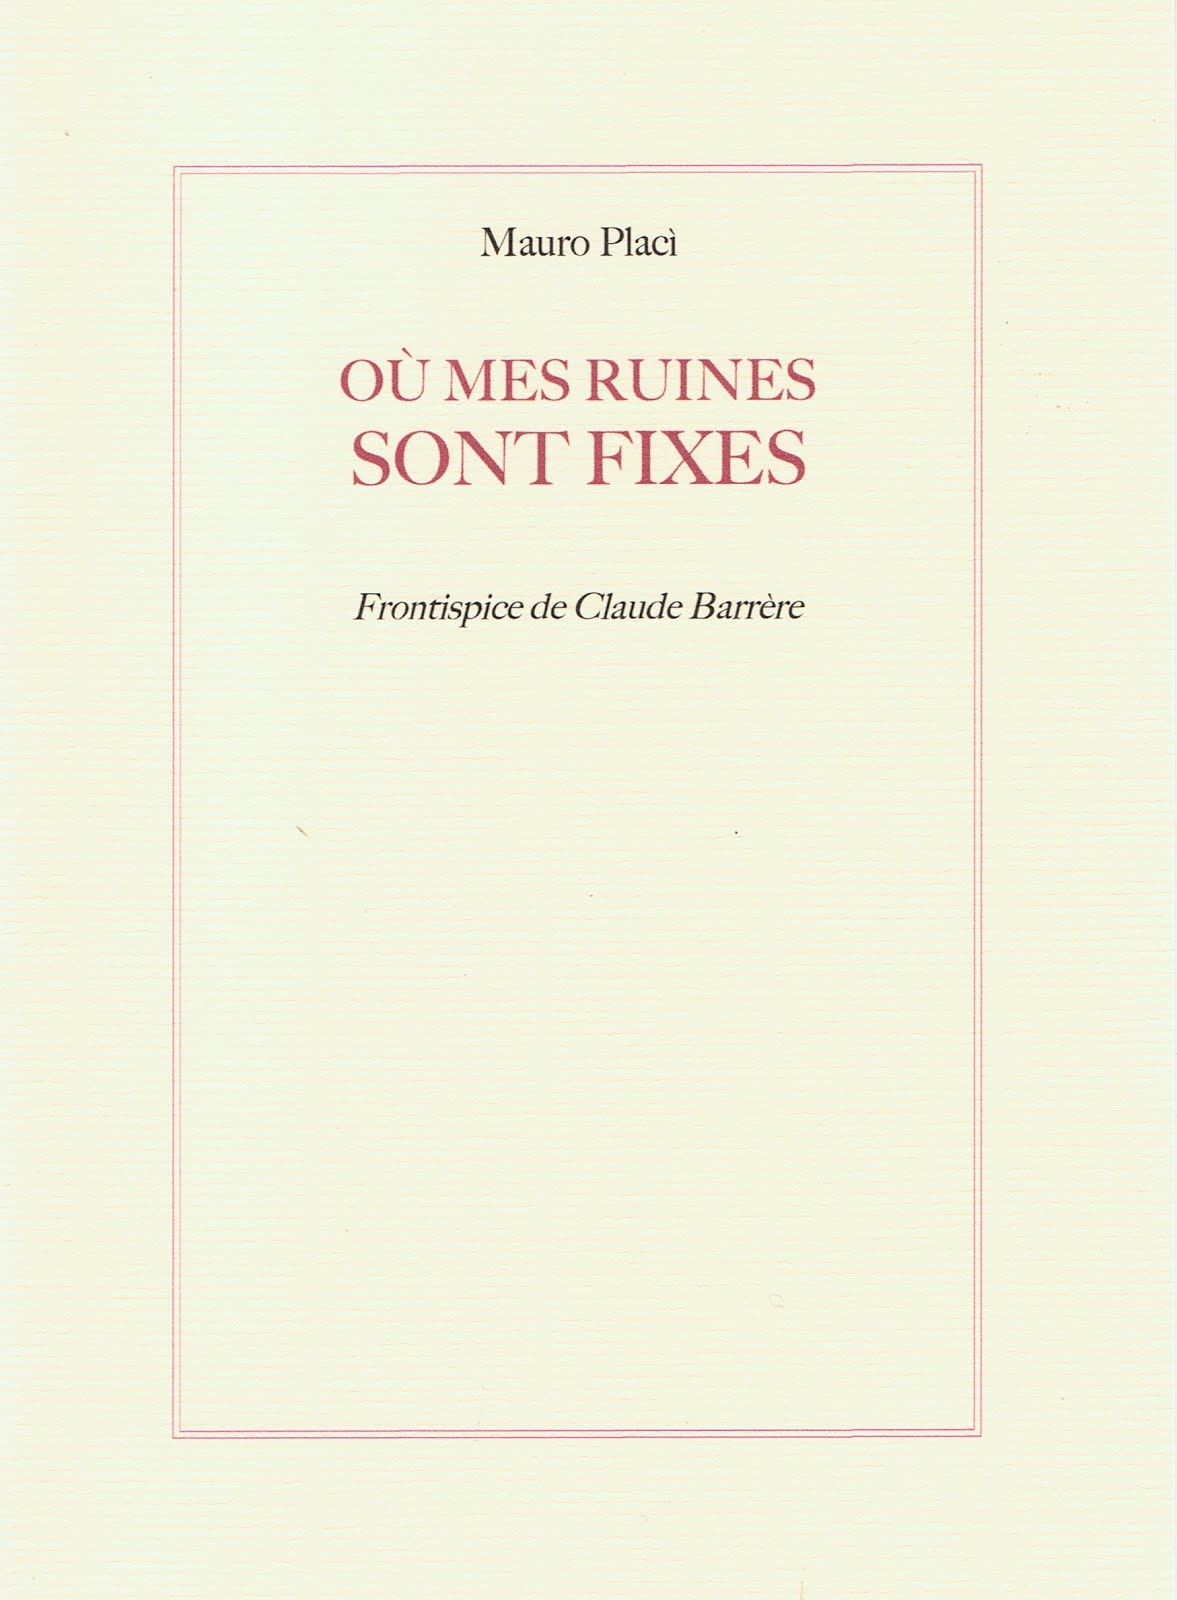 Mauro PLACI, OÙ MES RUINES SONT FIXES,  Frontispice de Claude Barrère